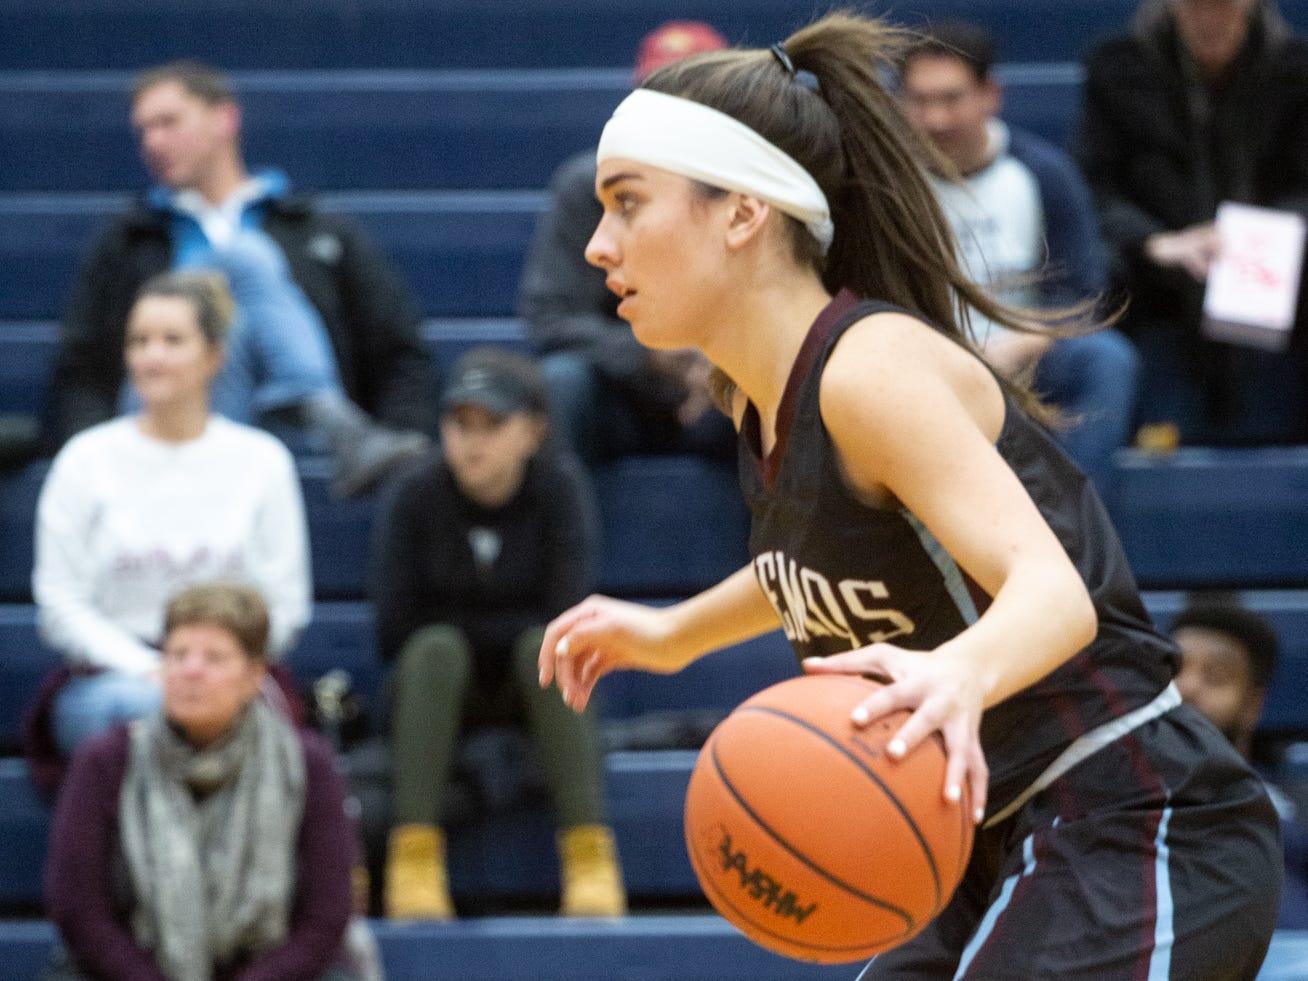 Okemos Sophomore, Lexie Sermak, brings ball down court, Tuesday, Jan. 8, 2019 at East Lansing High School.